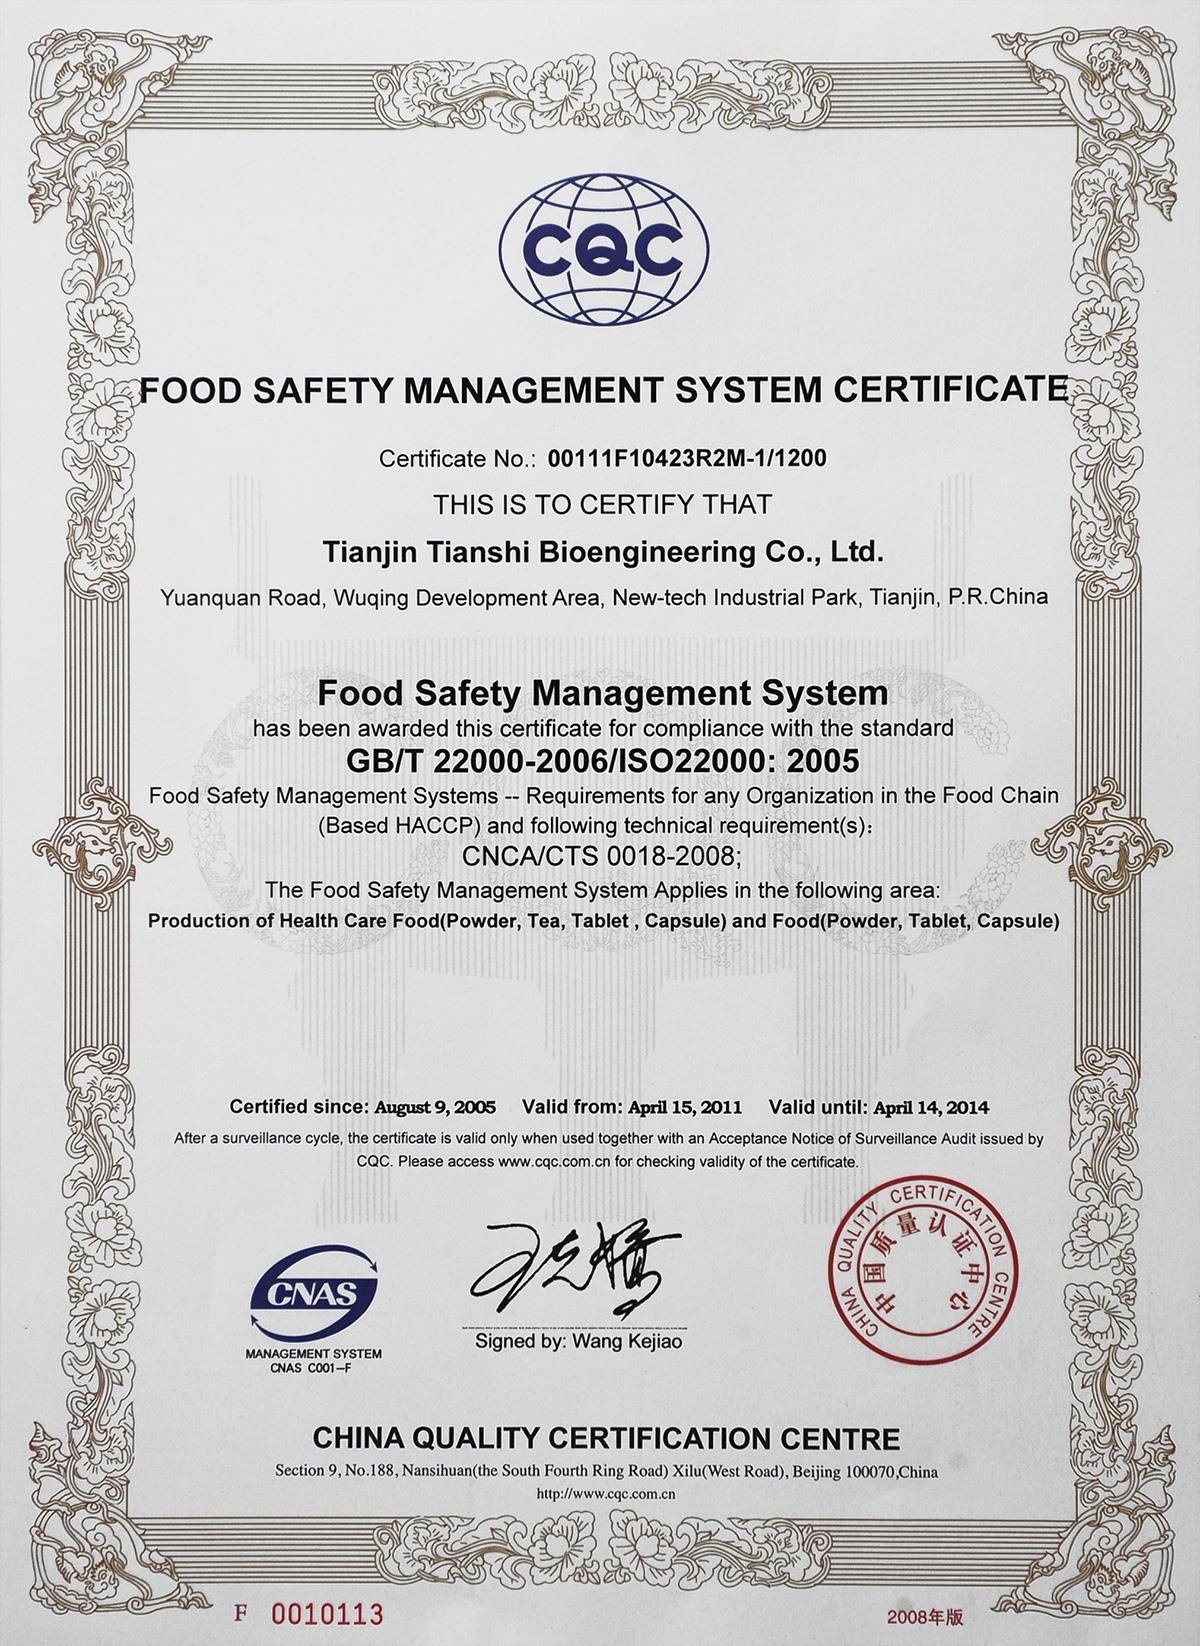 Сертификат Food safety фото 2